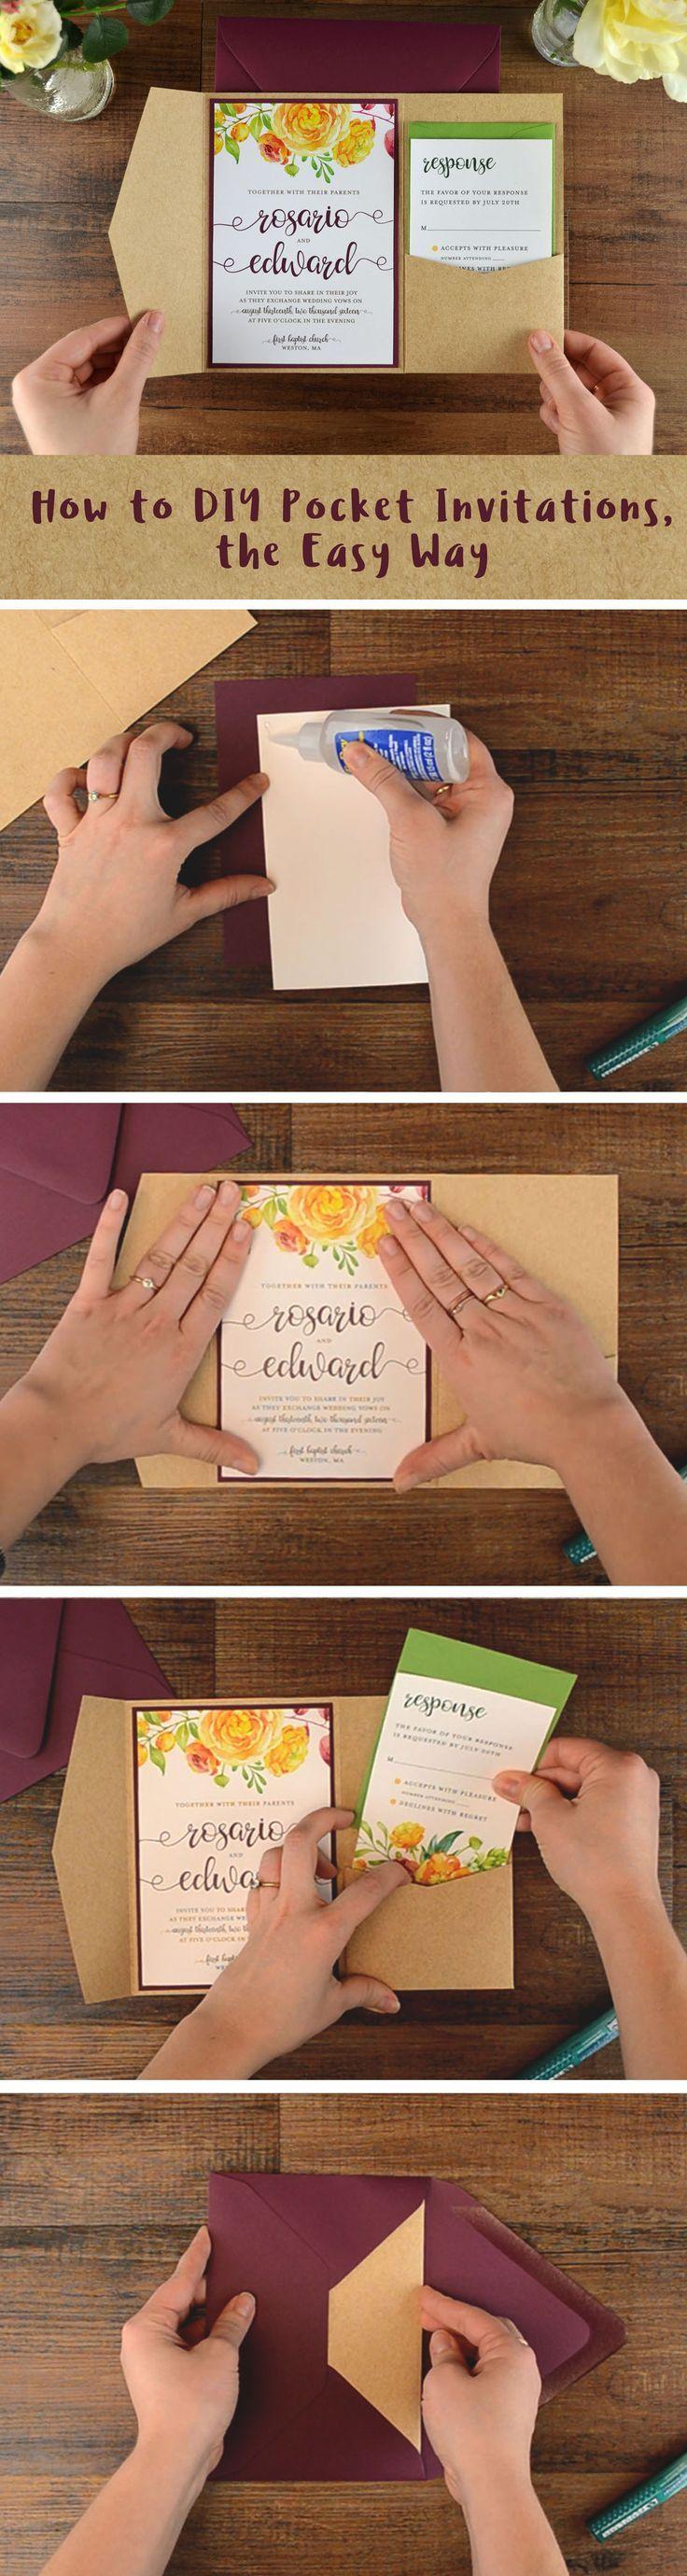 wedding card wordings simple%0A Easy DIY Pocket Invitation   It u    s easy to create cheap wedding invitations  when you DIY